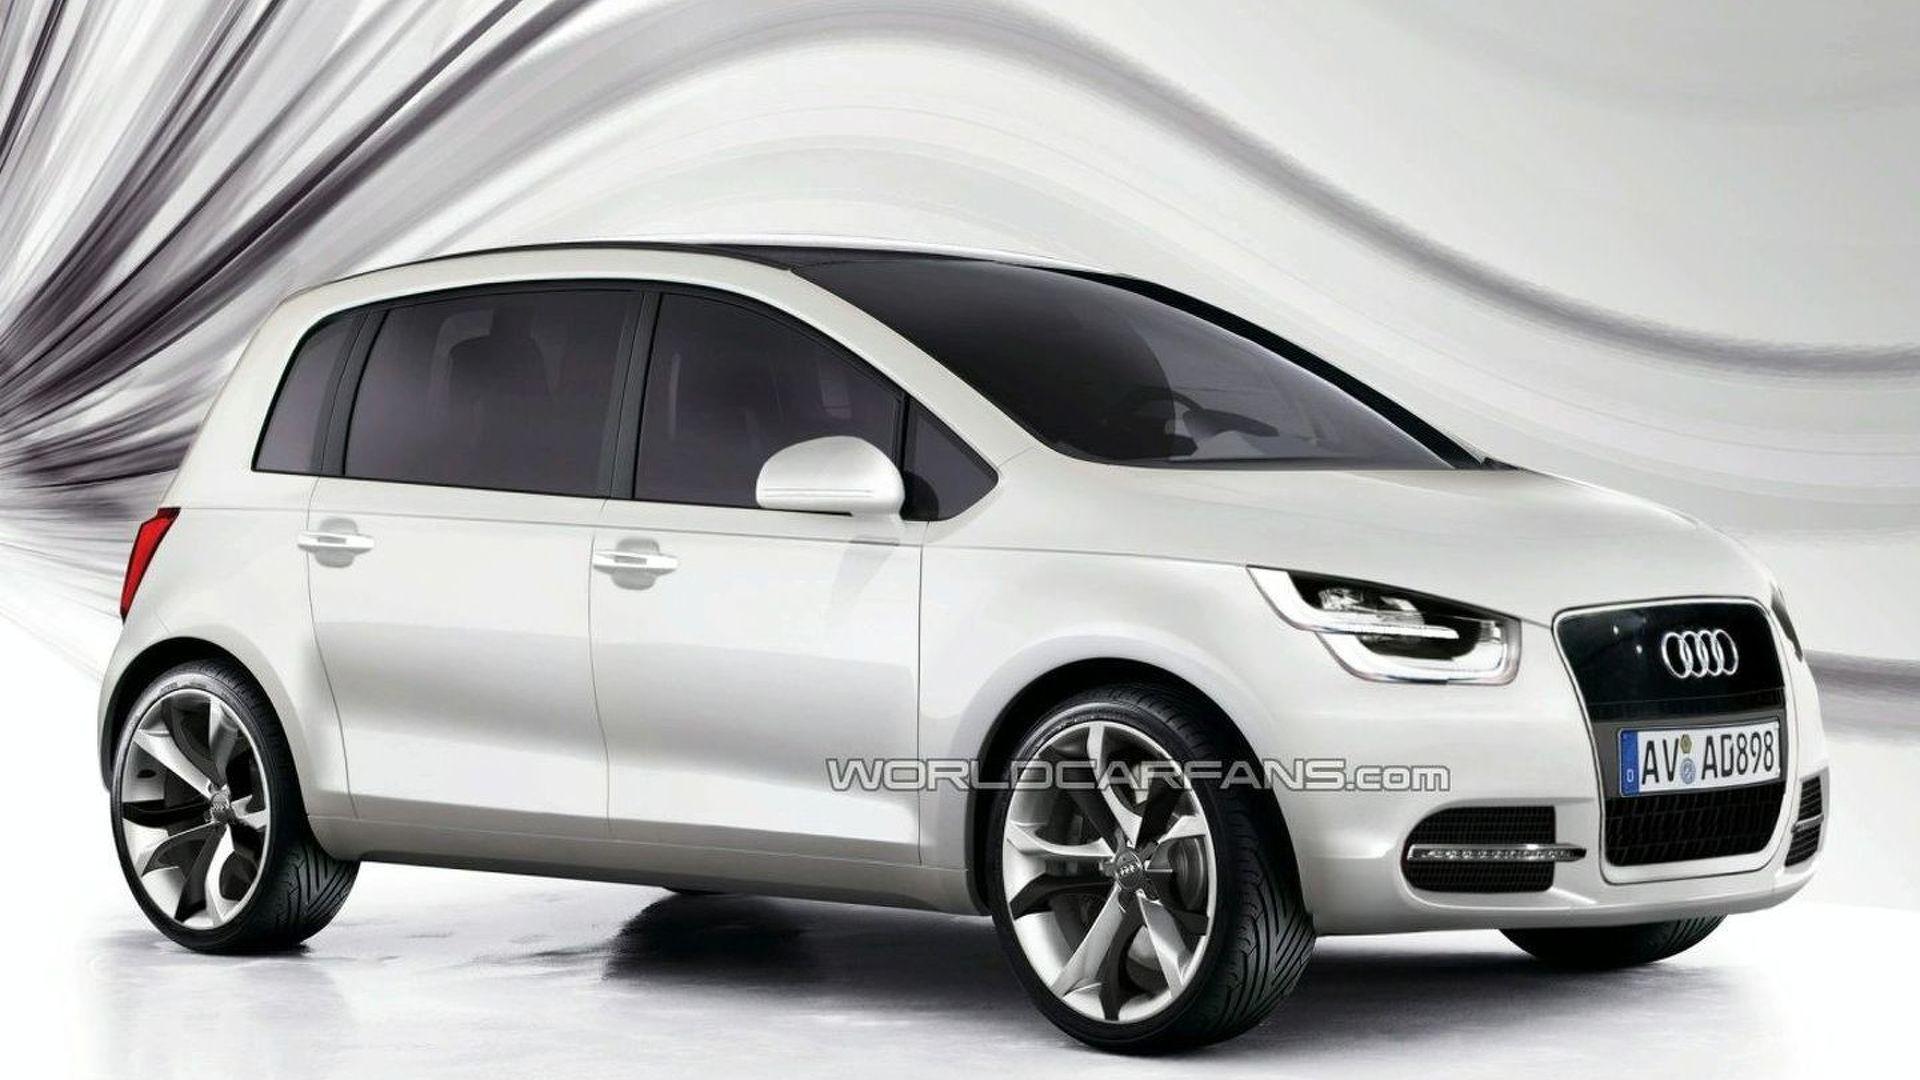 New Audi A Development Reaches Concept Car Stage - Audi a2